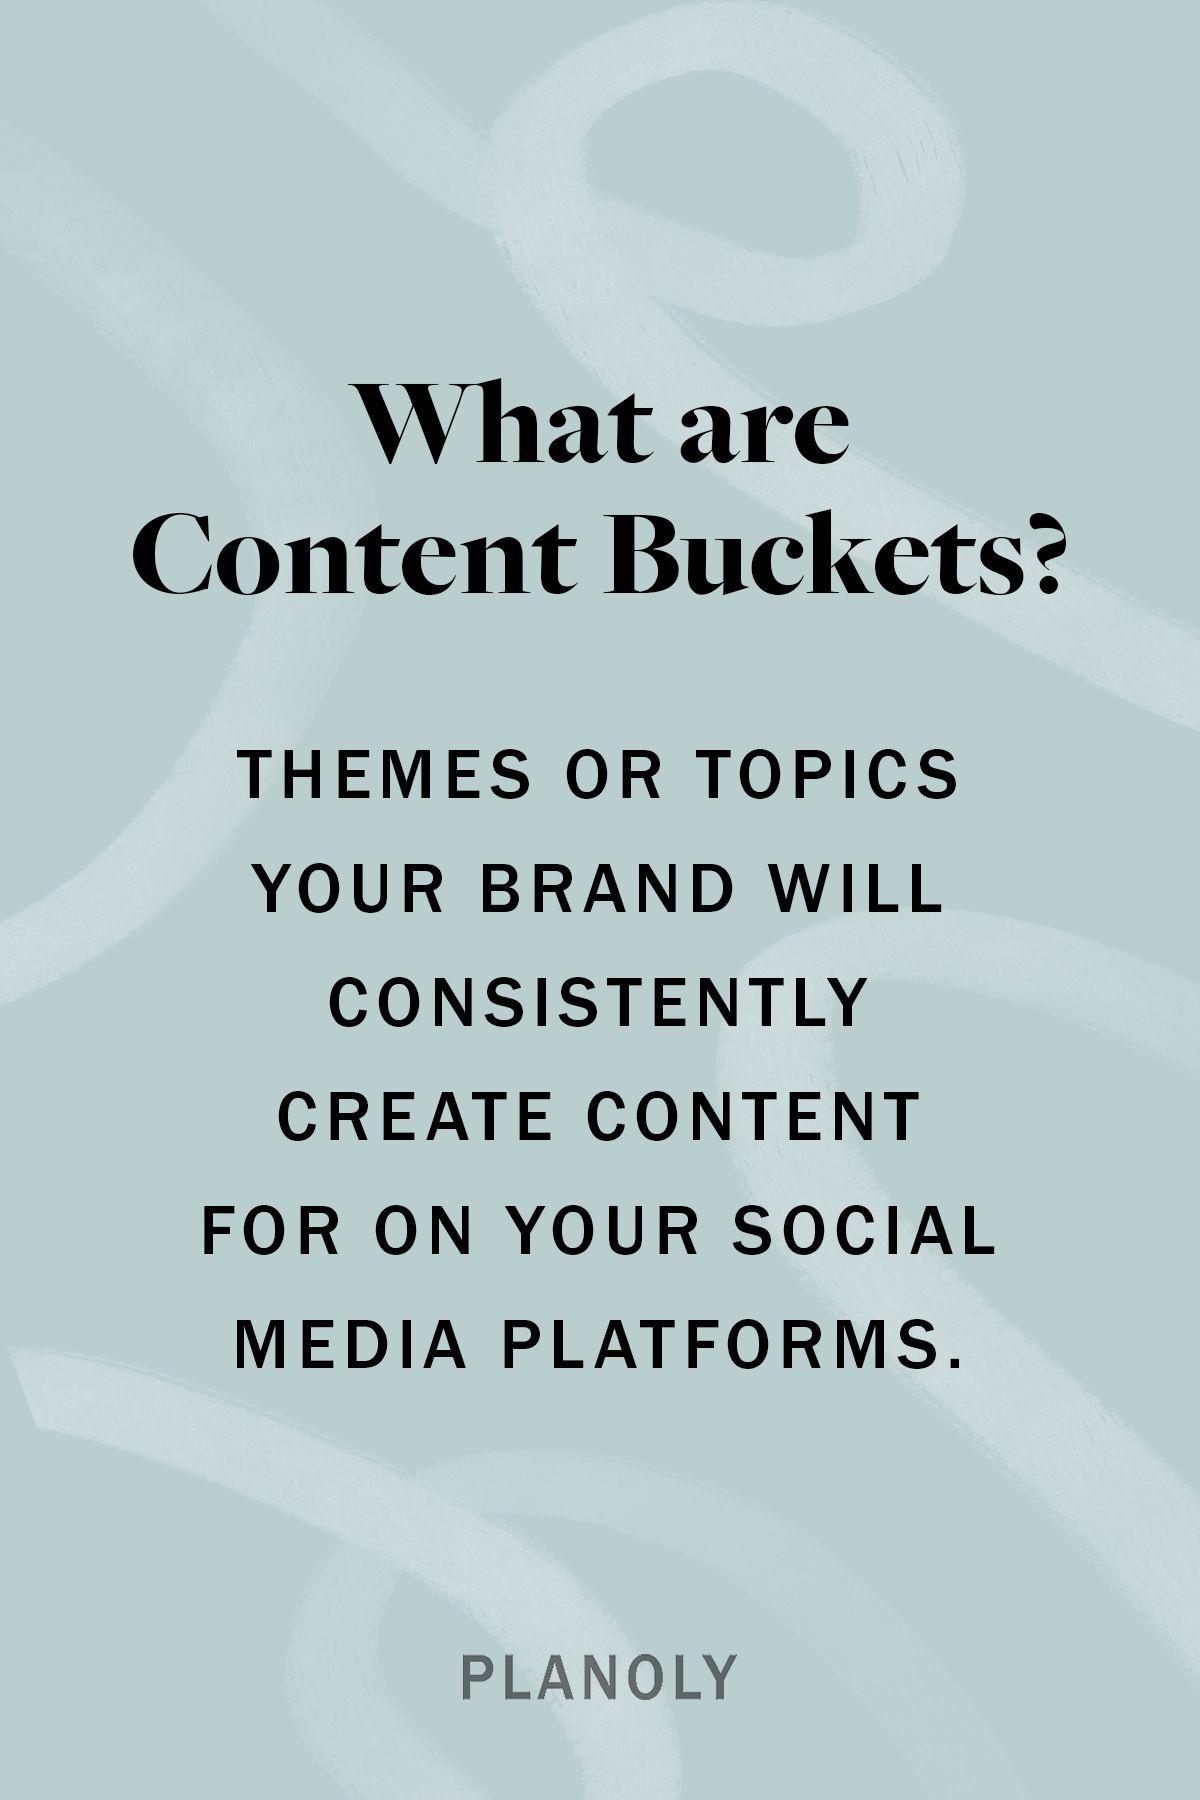 PLANOLY - Blog - Content Buckets - Vertical - 2